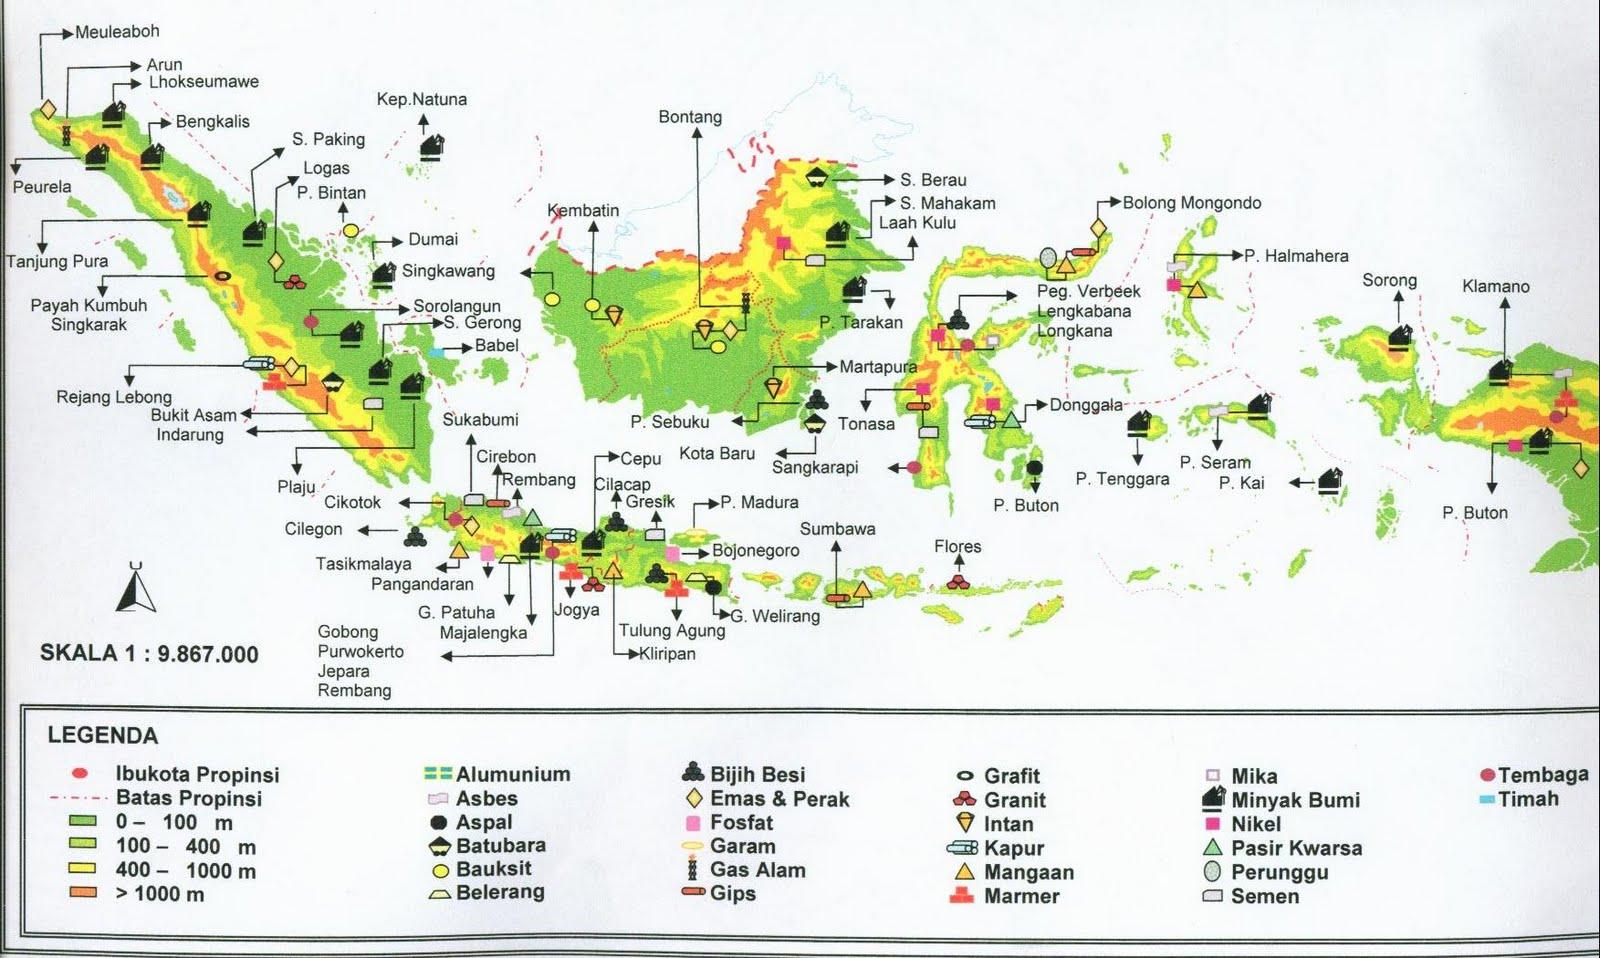 Peta kekayaan Sumber Daya Alam Indonesia (www.geoarround.com)